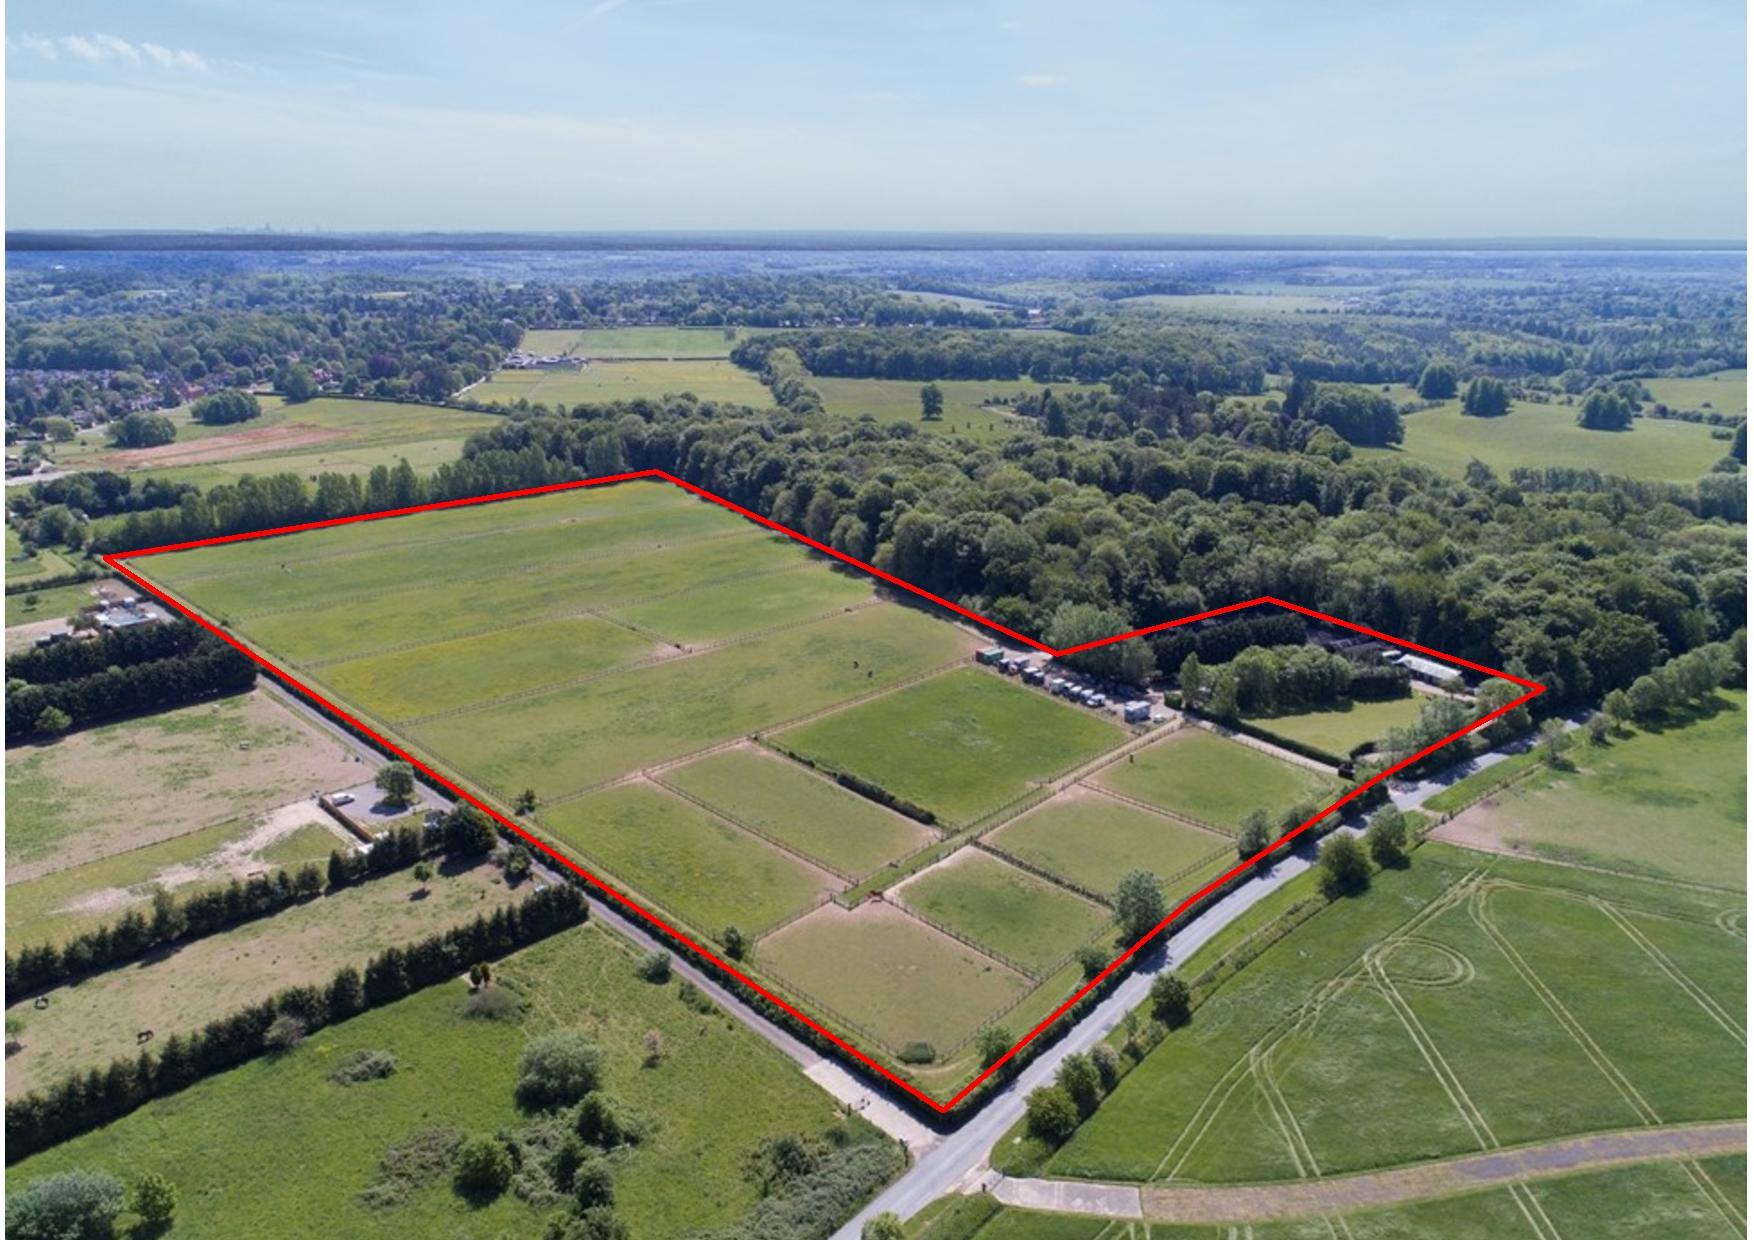 Similar property | CROSS LANES FARM - CHALFONT SAINT GILES